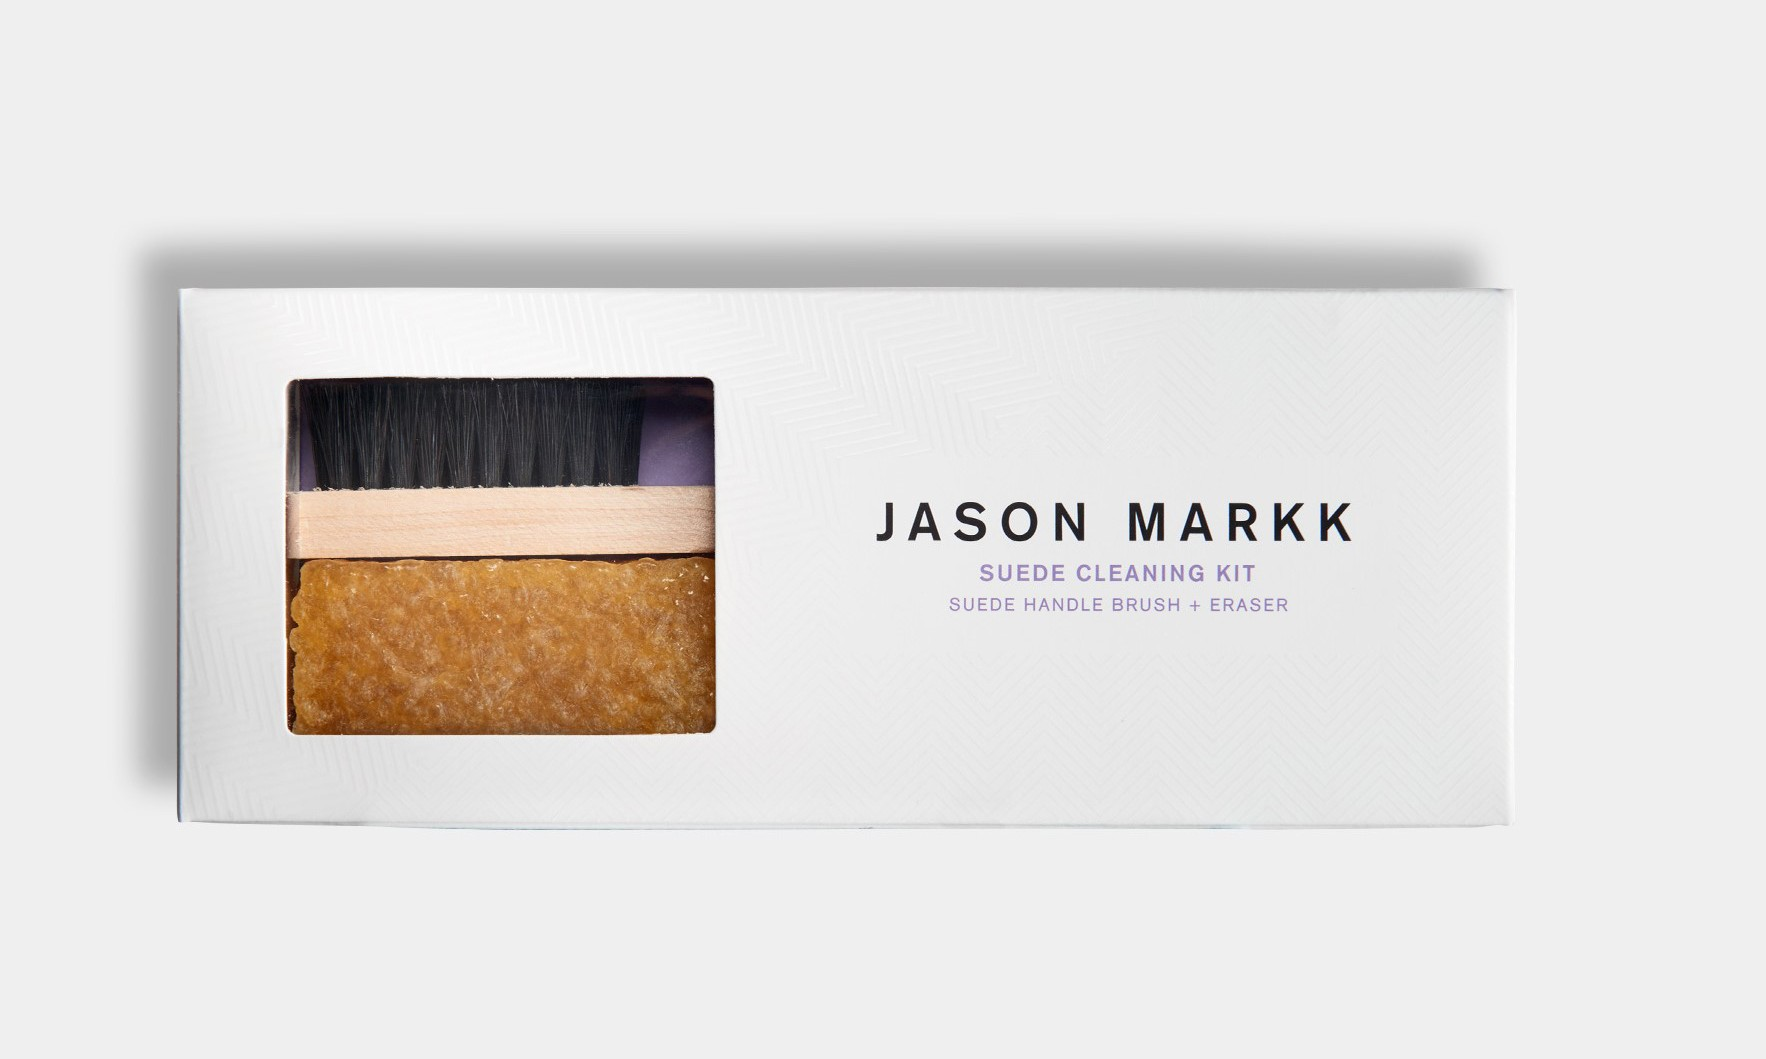 Jason Markk 全新发布麂皮球鞋清洁套装